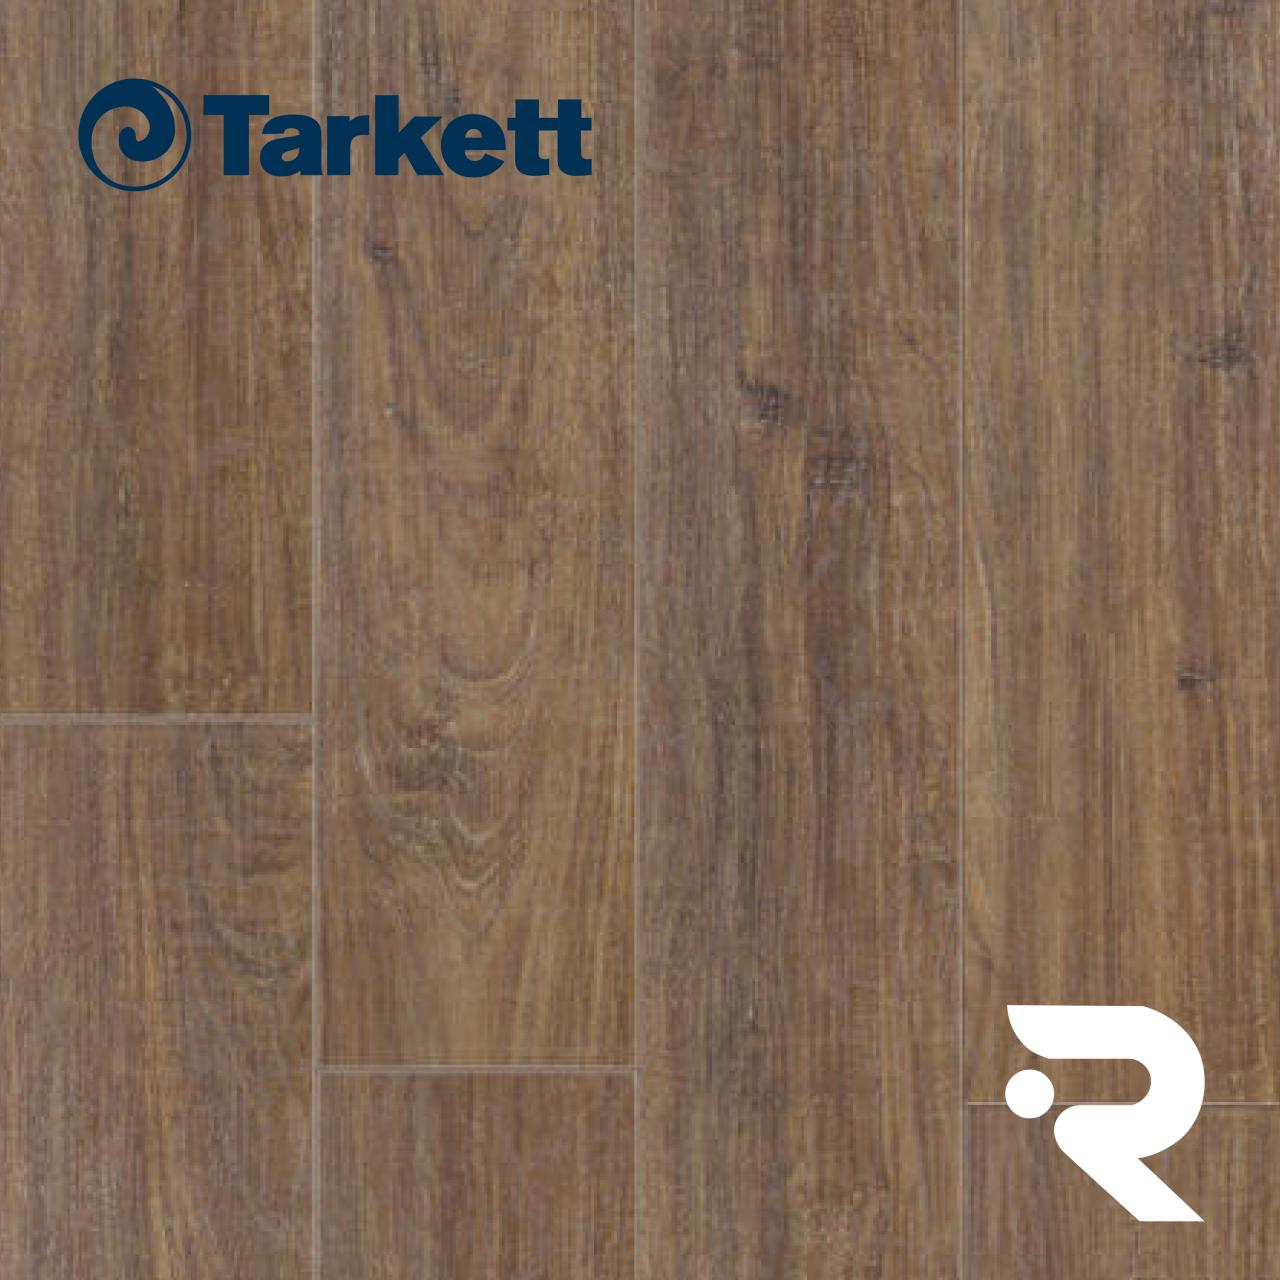 🌳 ПВХ плитка Tarkett | LOUNGE - SERGE | Art Vinyl | 914 x 152 мм